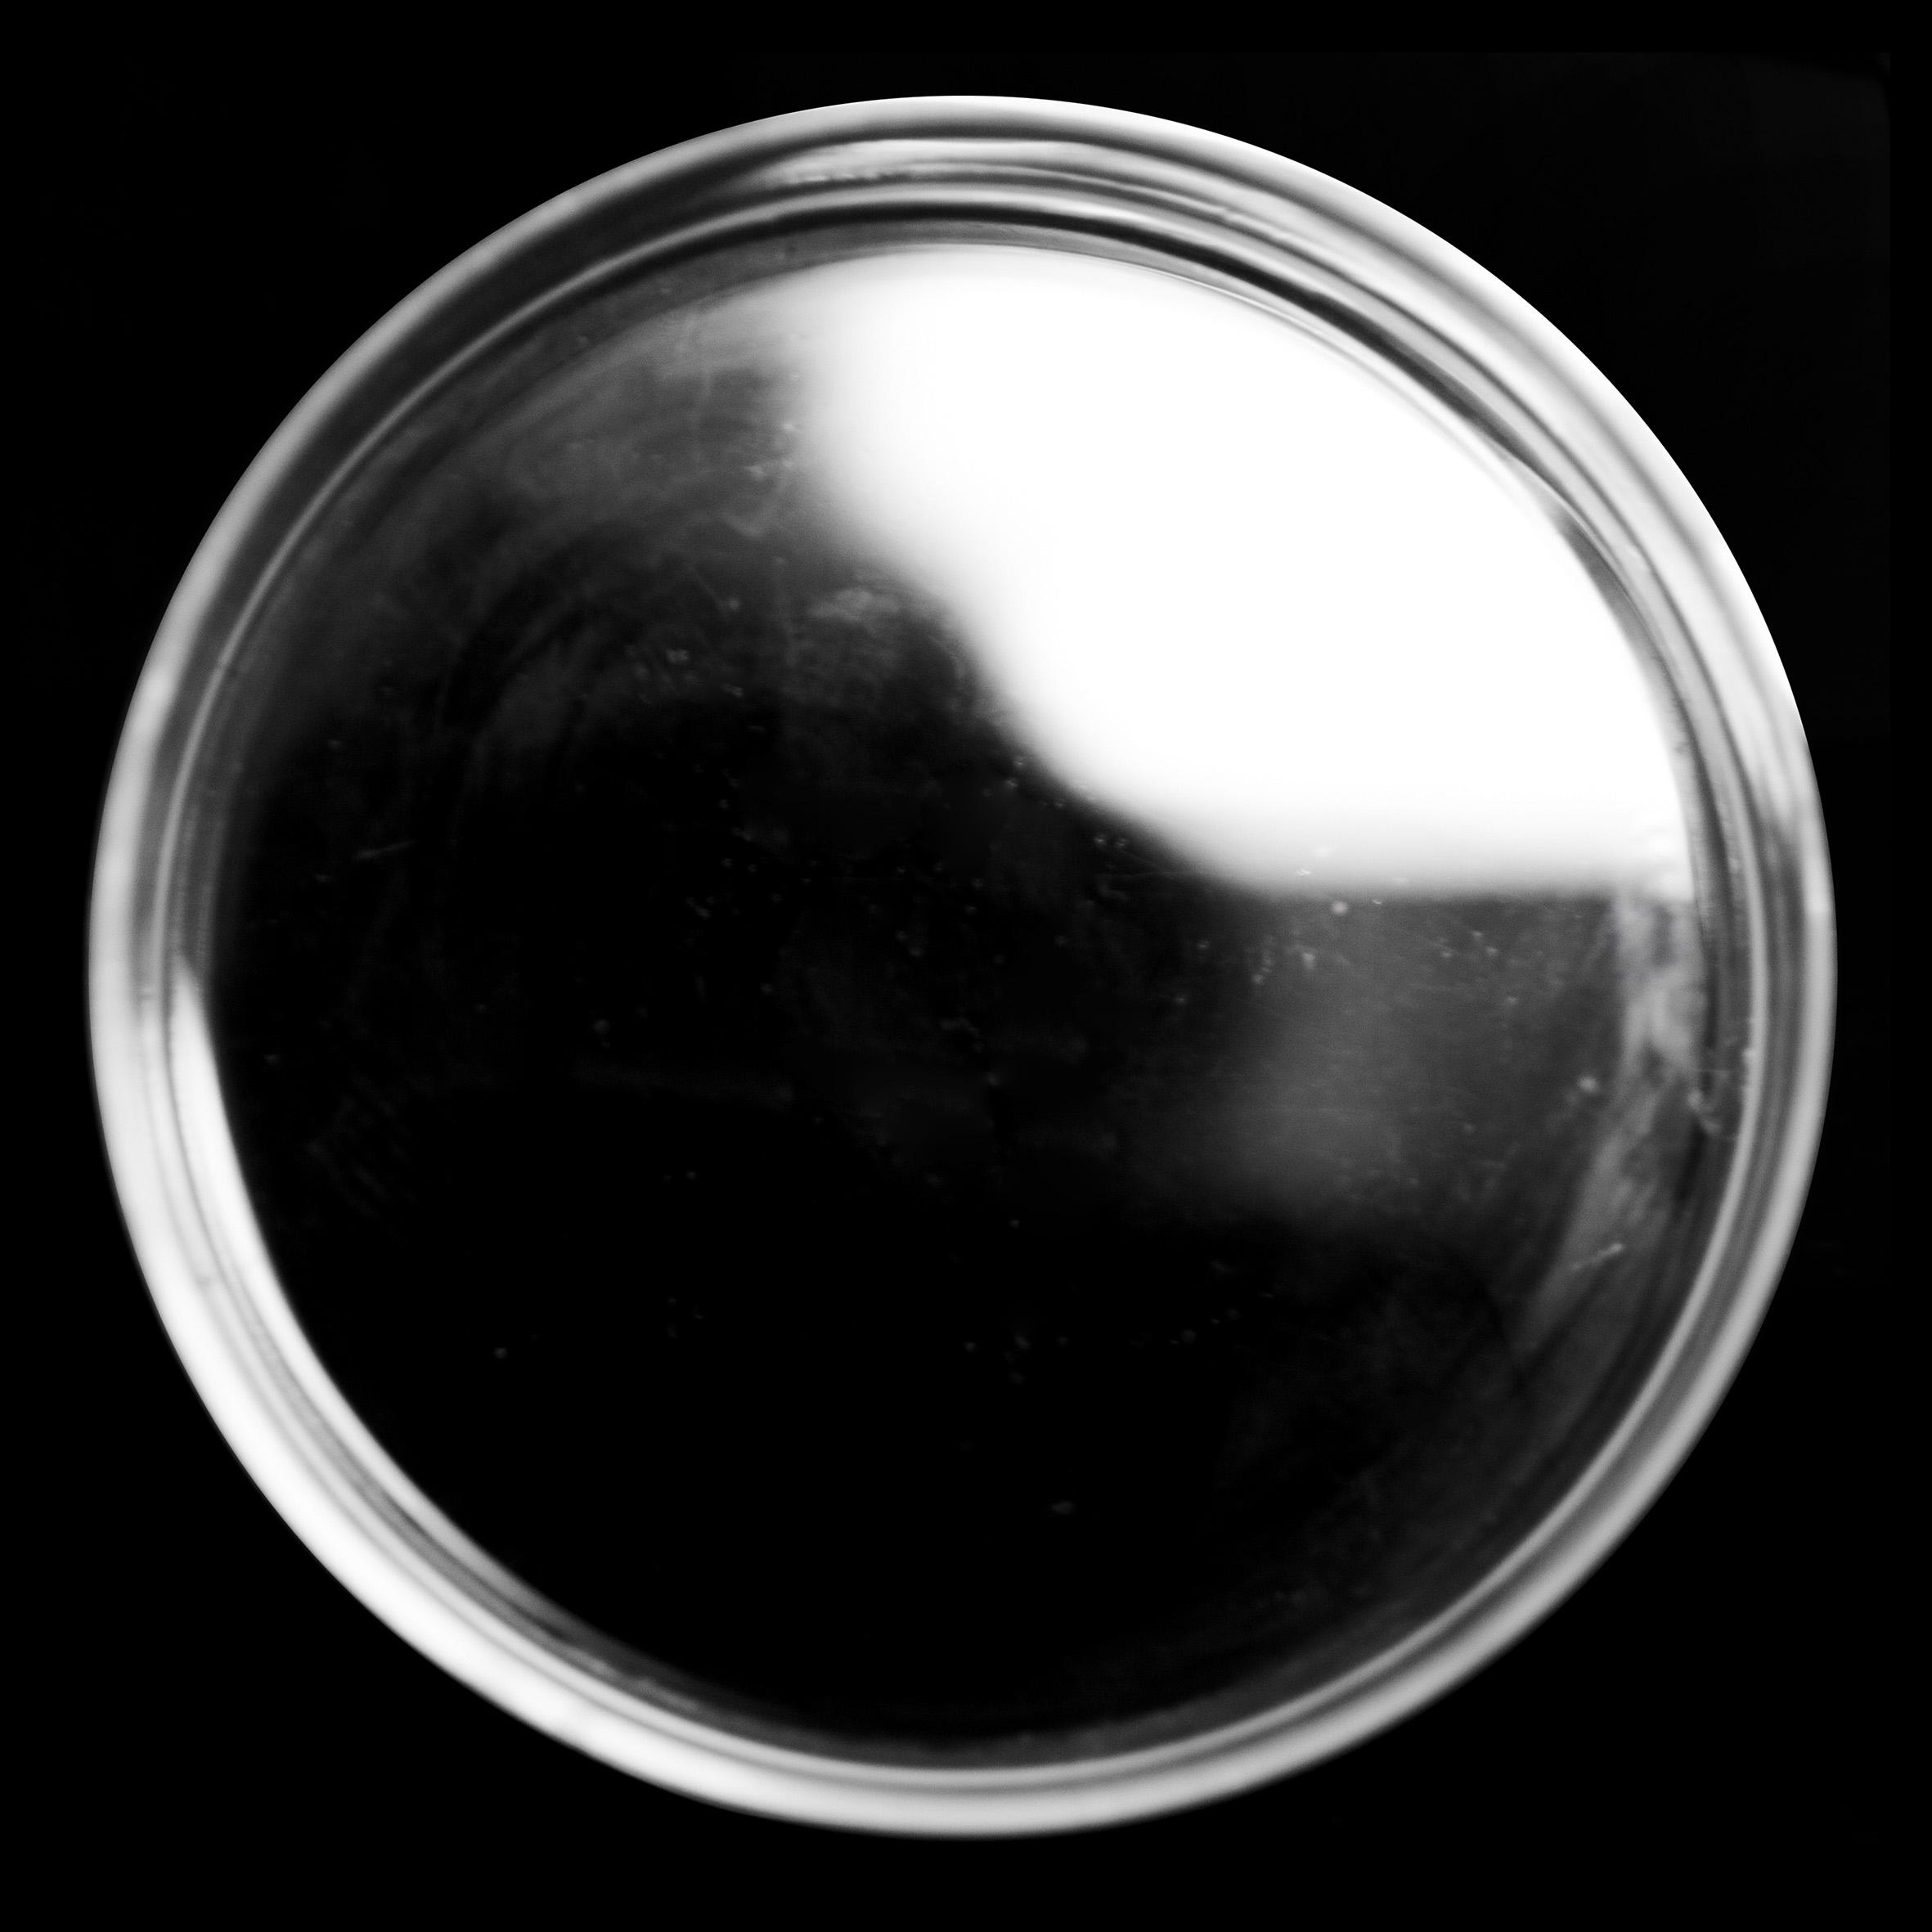 Hz-12. 18 Hz-.Tonoscoop-patroon